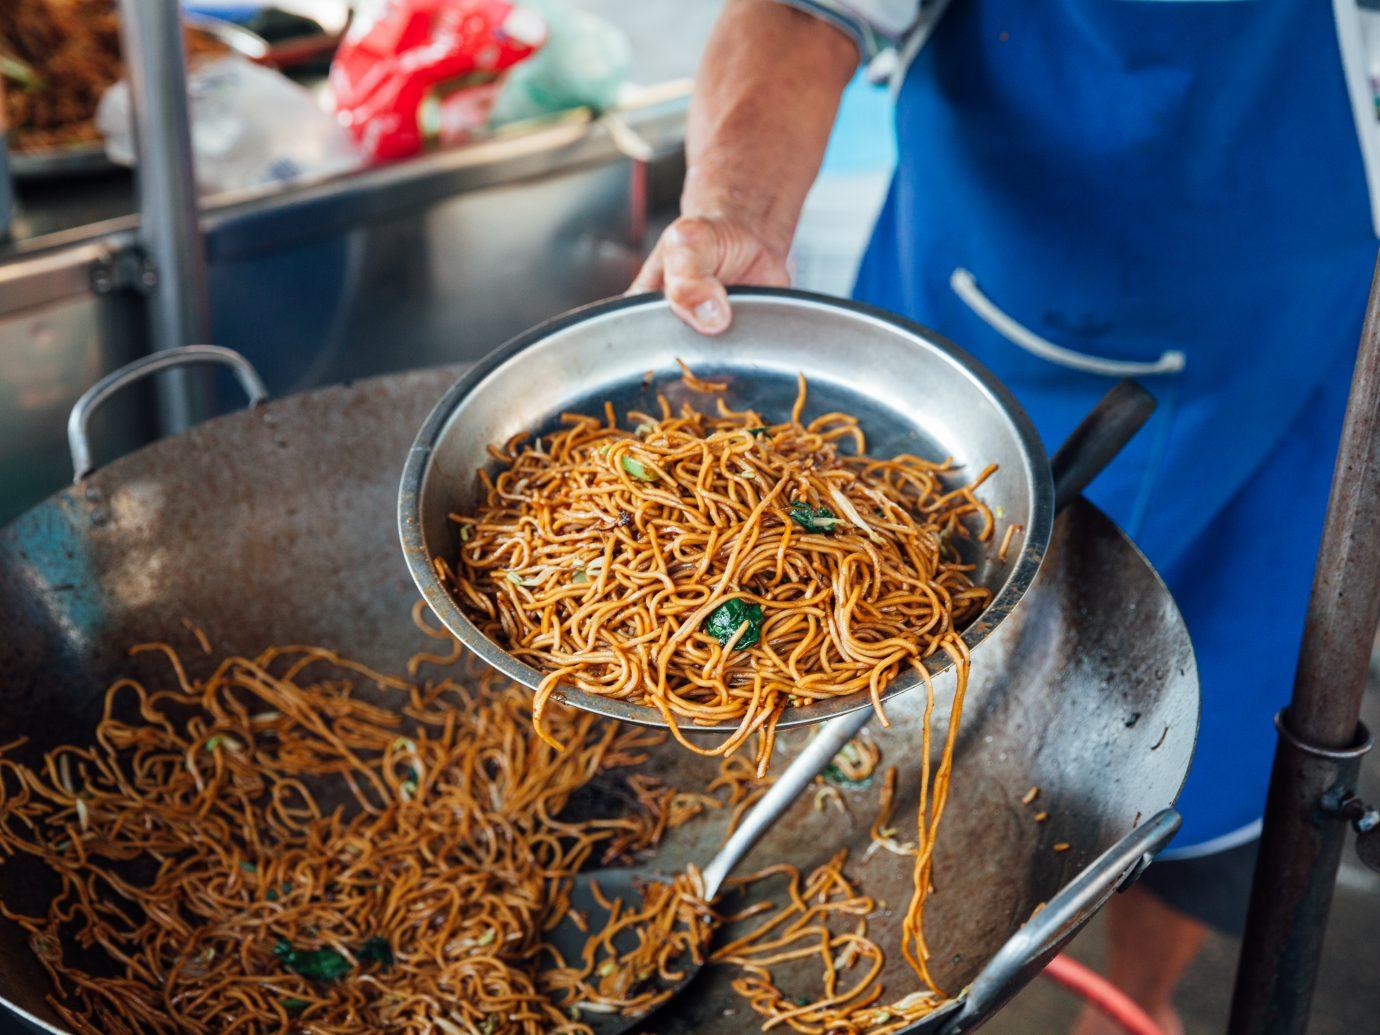 Street food at Kimberly Street Food Night Market. George Town, Penang, Malaysia.